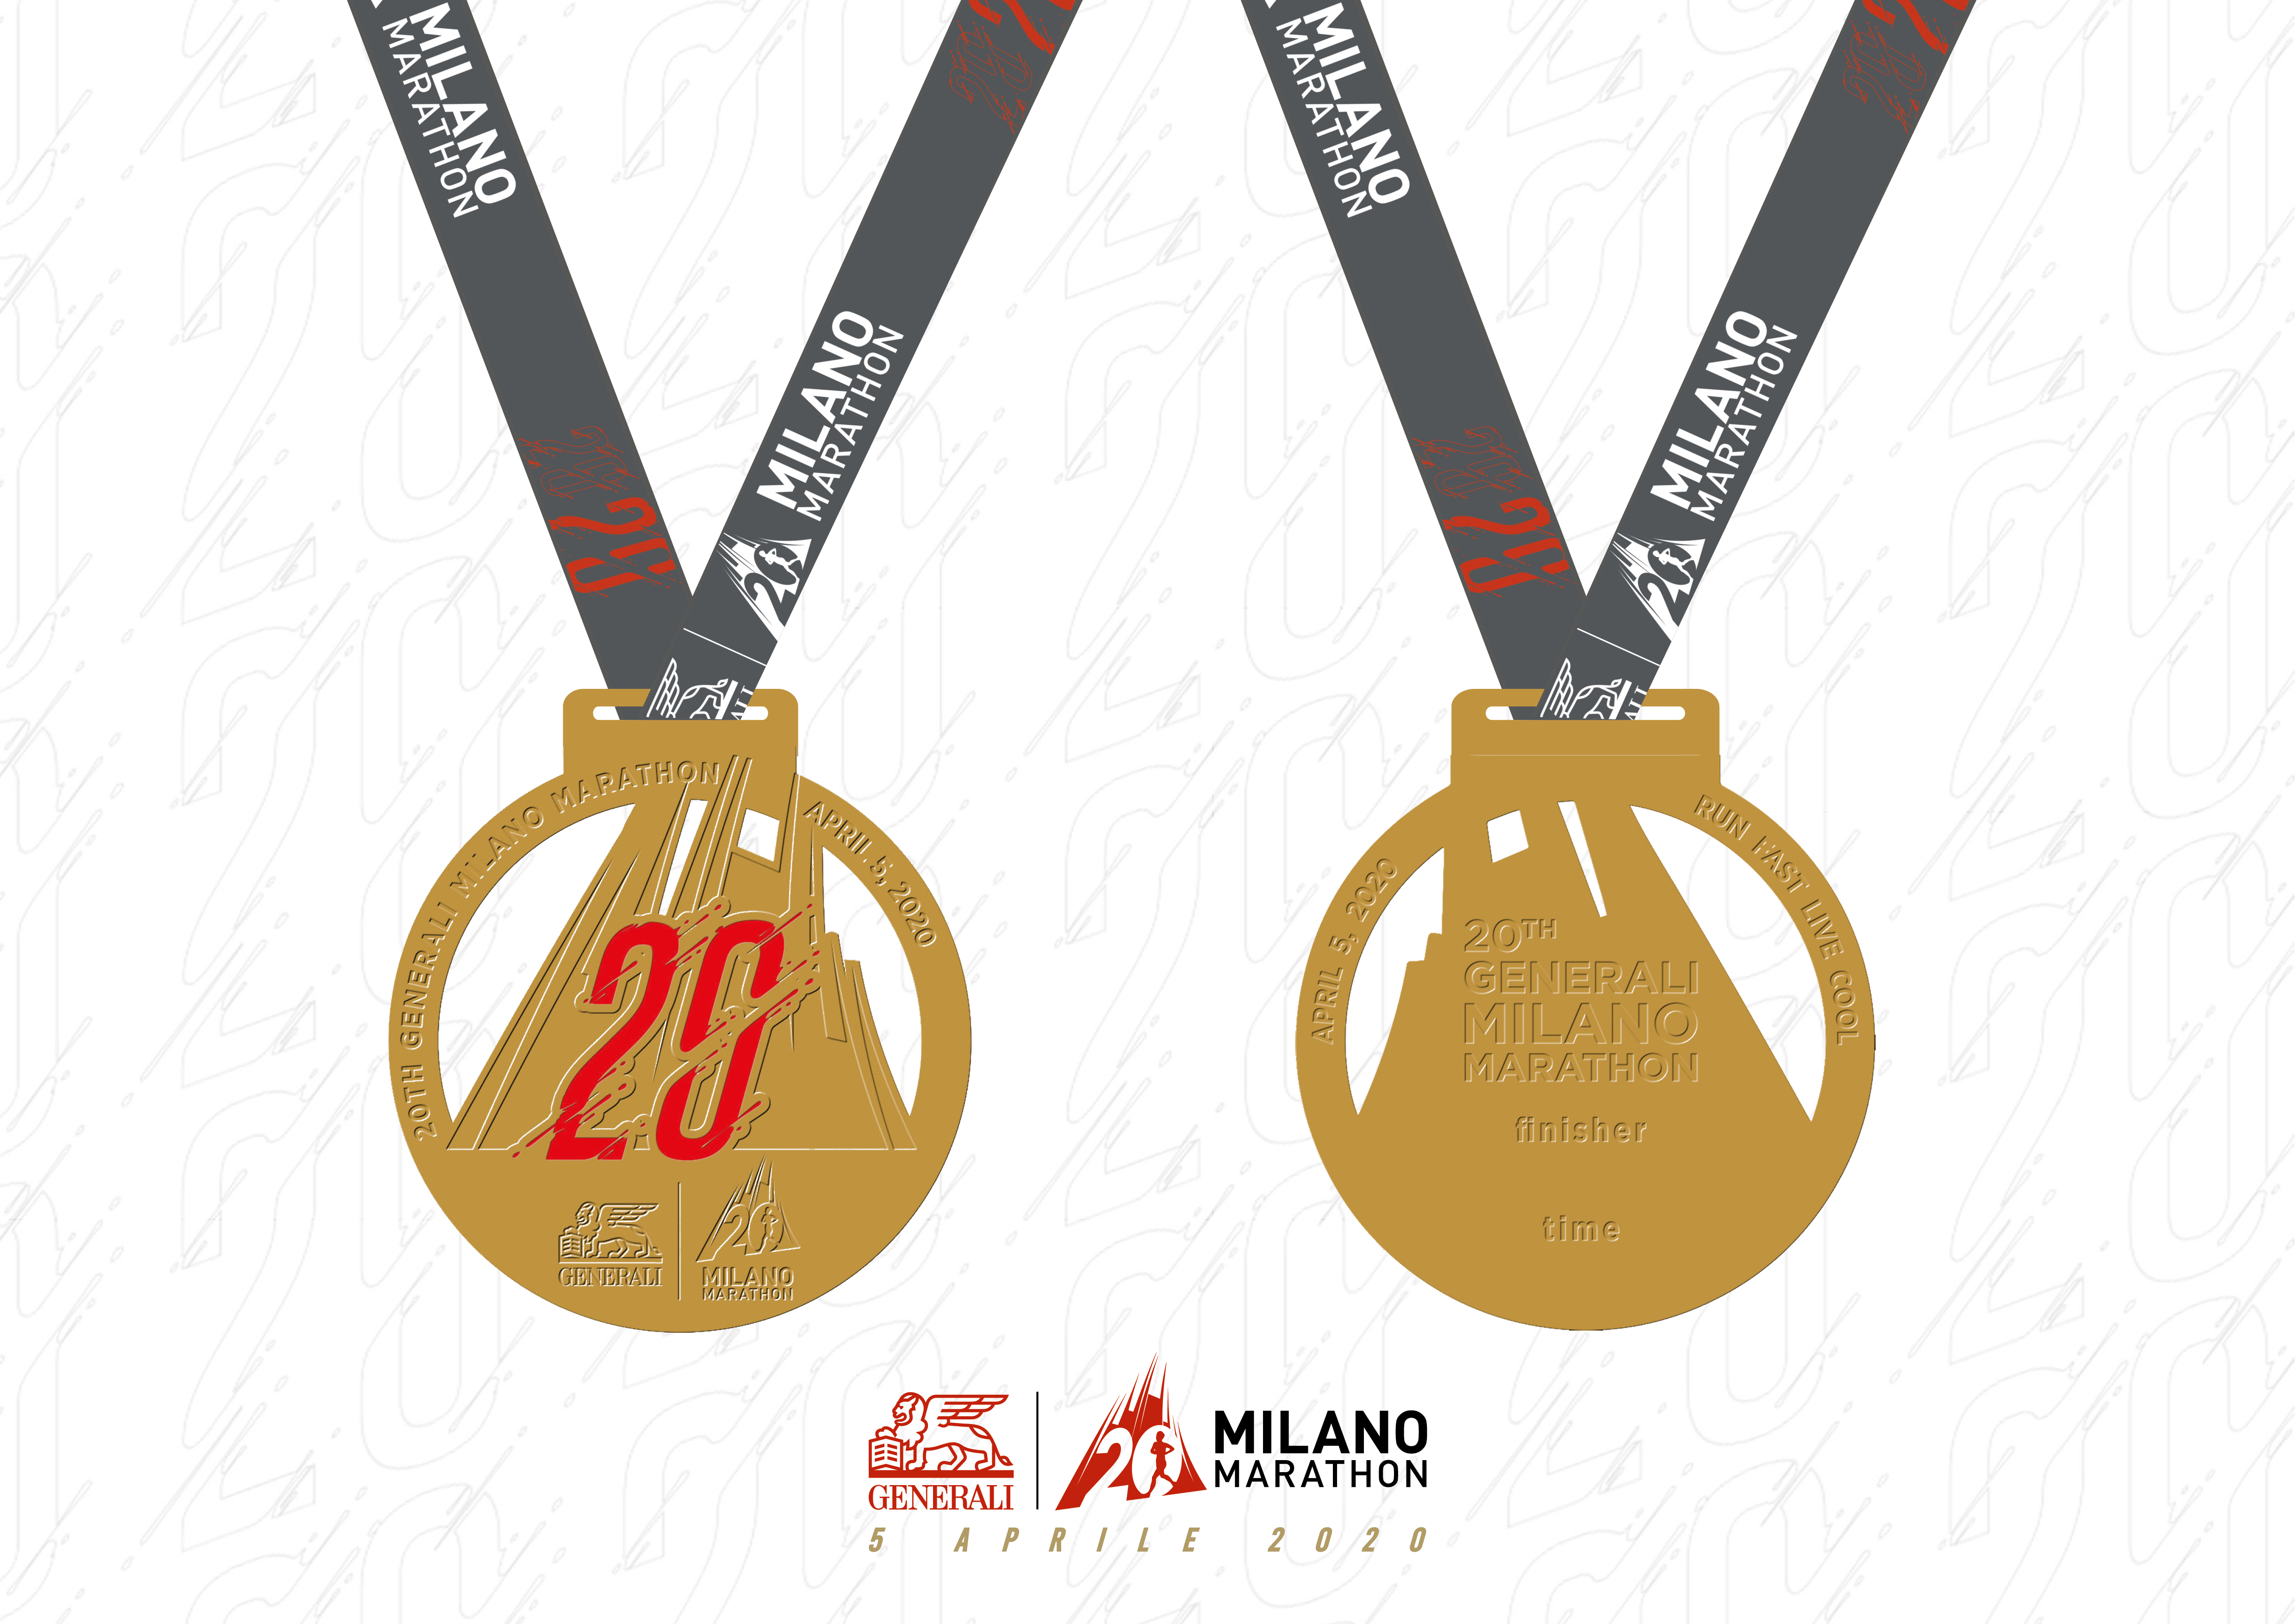 Generali Milano Marathon 2020: svelata la medaglia